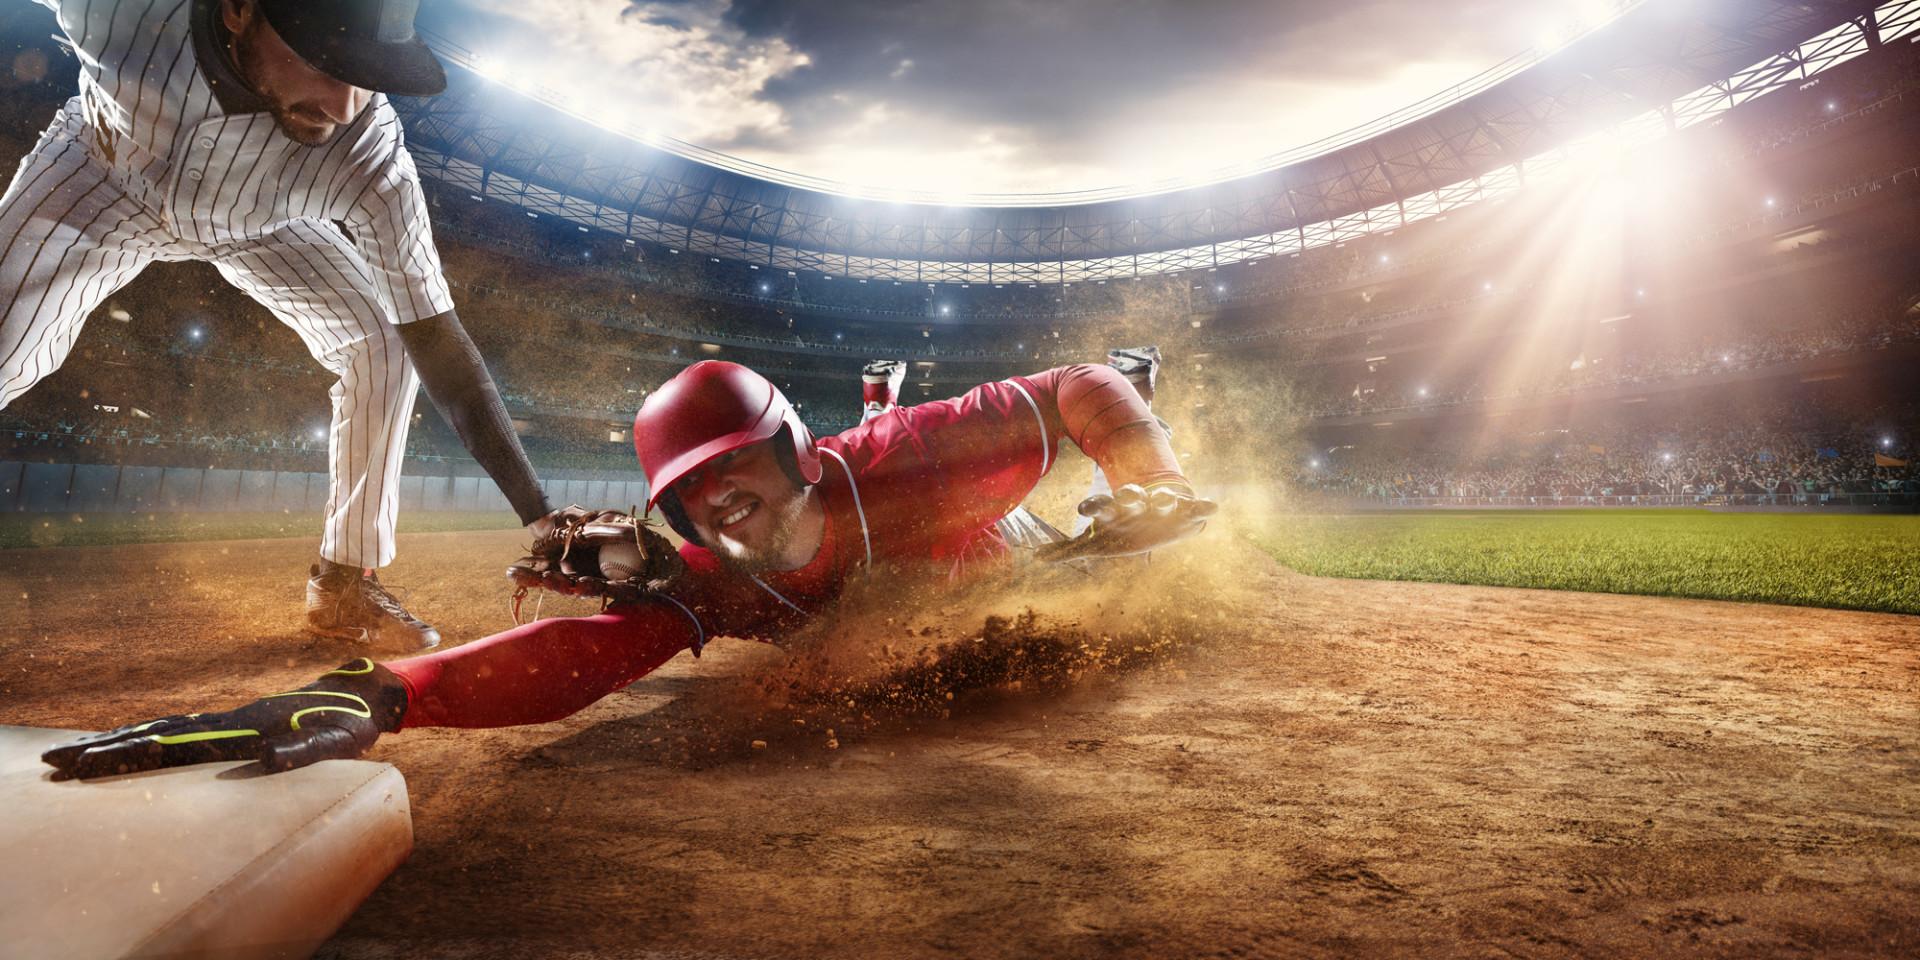 23_03_2016_baseball_game_07-1920x960